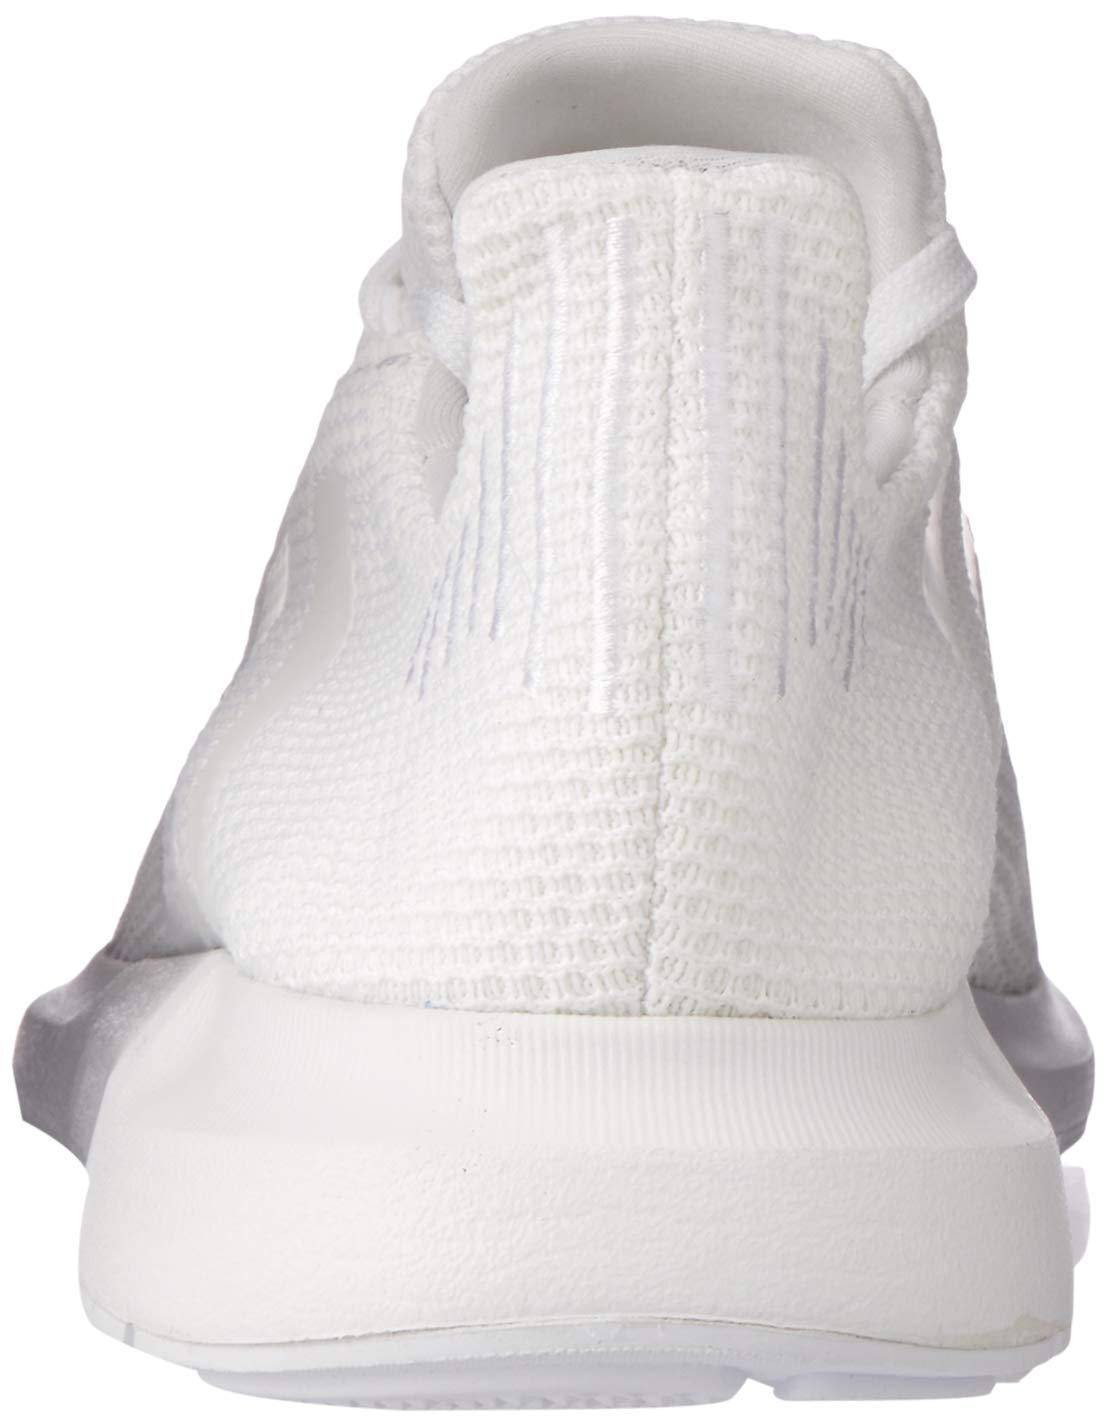 adidas Swift Run, Scarpe da Fitness Uomo 11 spesavip